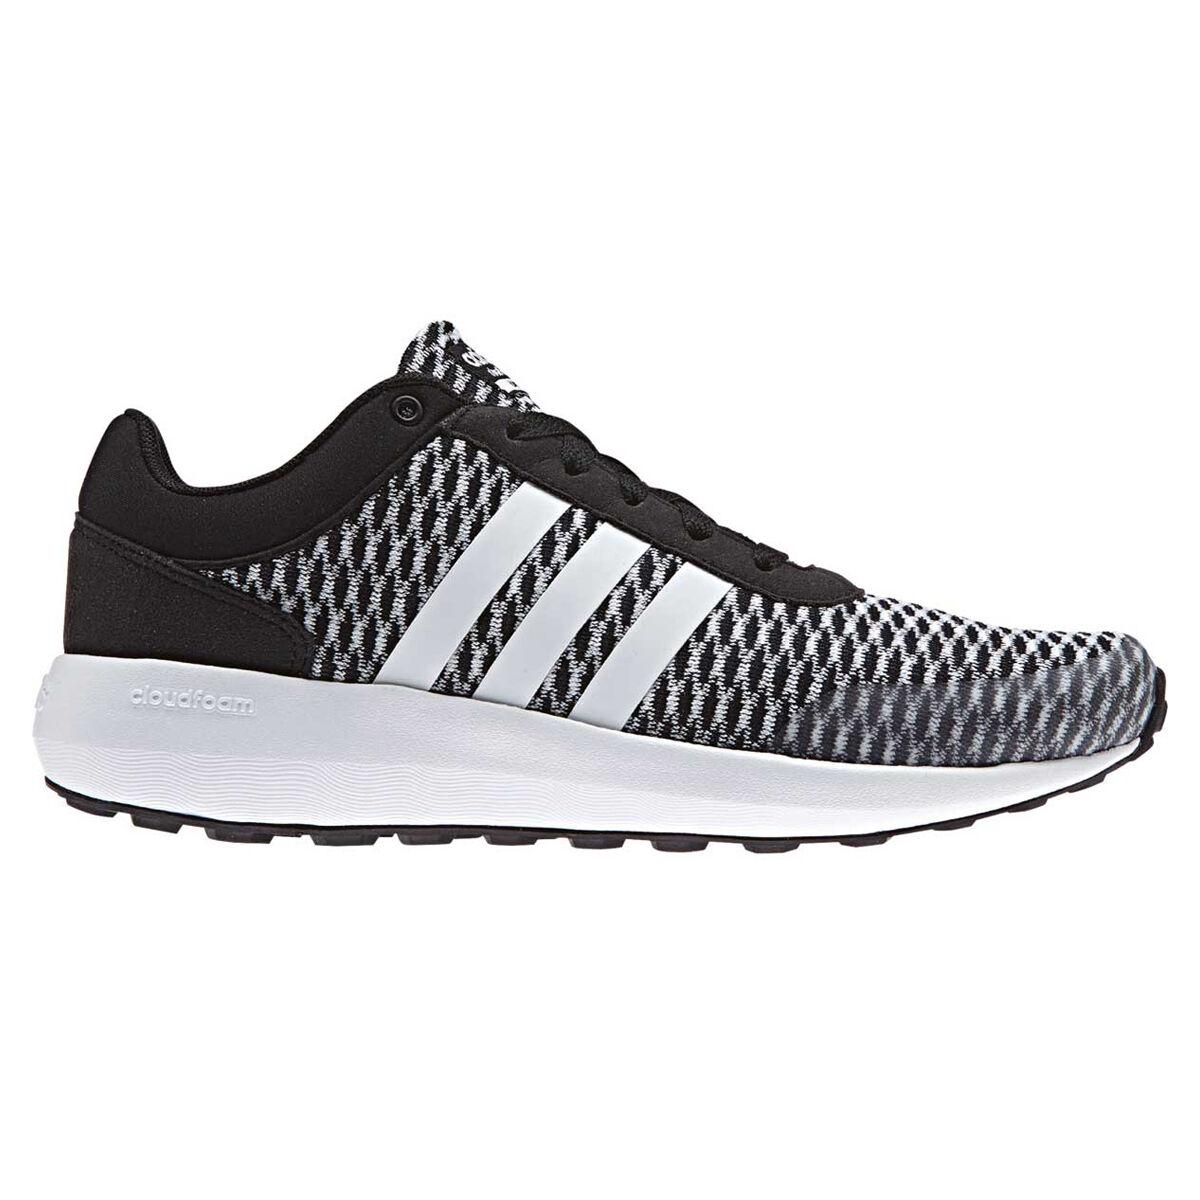 Adidas cloudfoam raza  mujer Casual zapatos negro / GRIS US 9 rebeldes